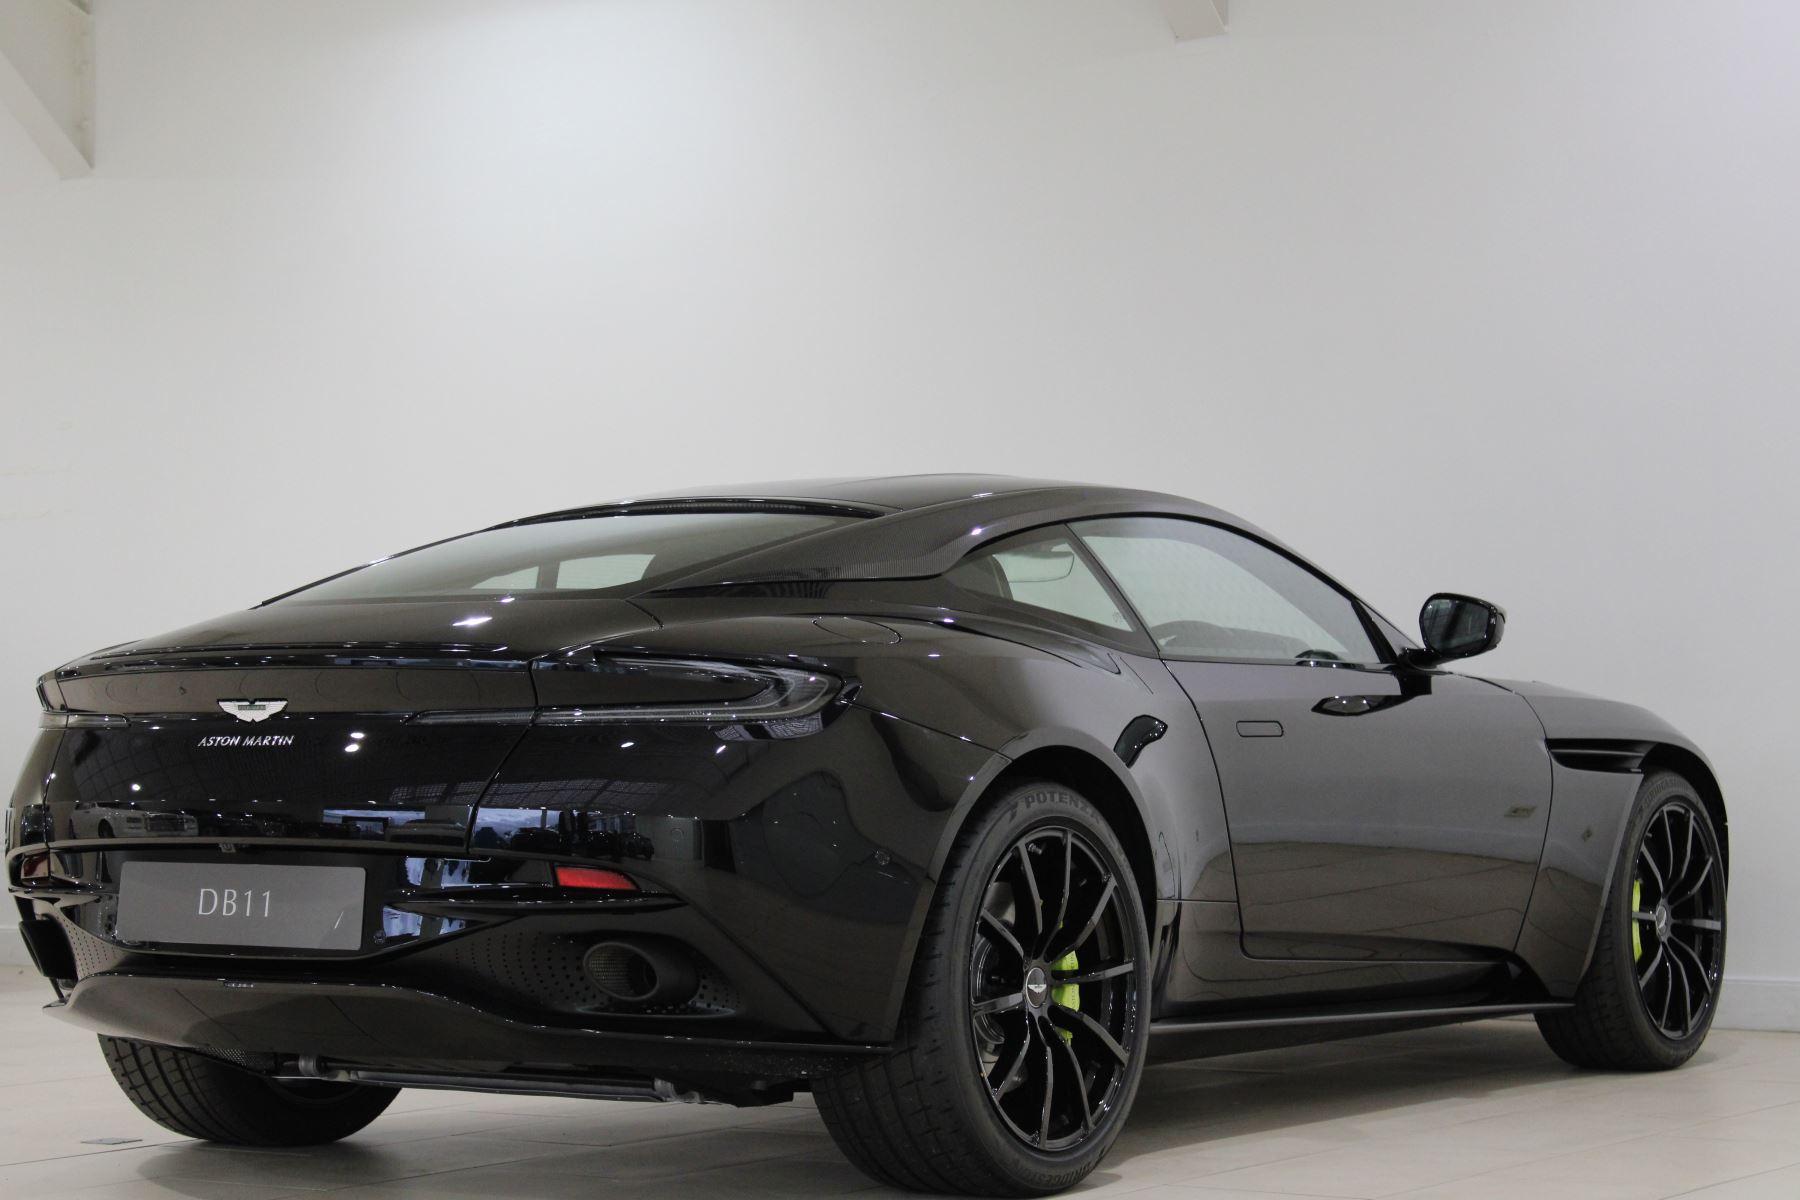 Aston Martin DB11 V12 AMR Touchtronic image 27